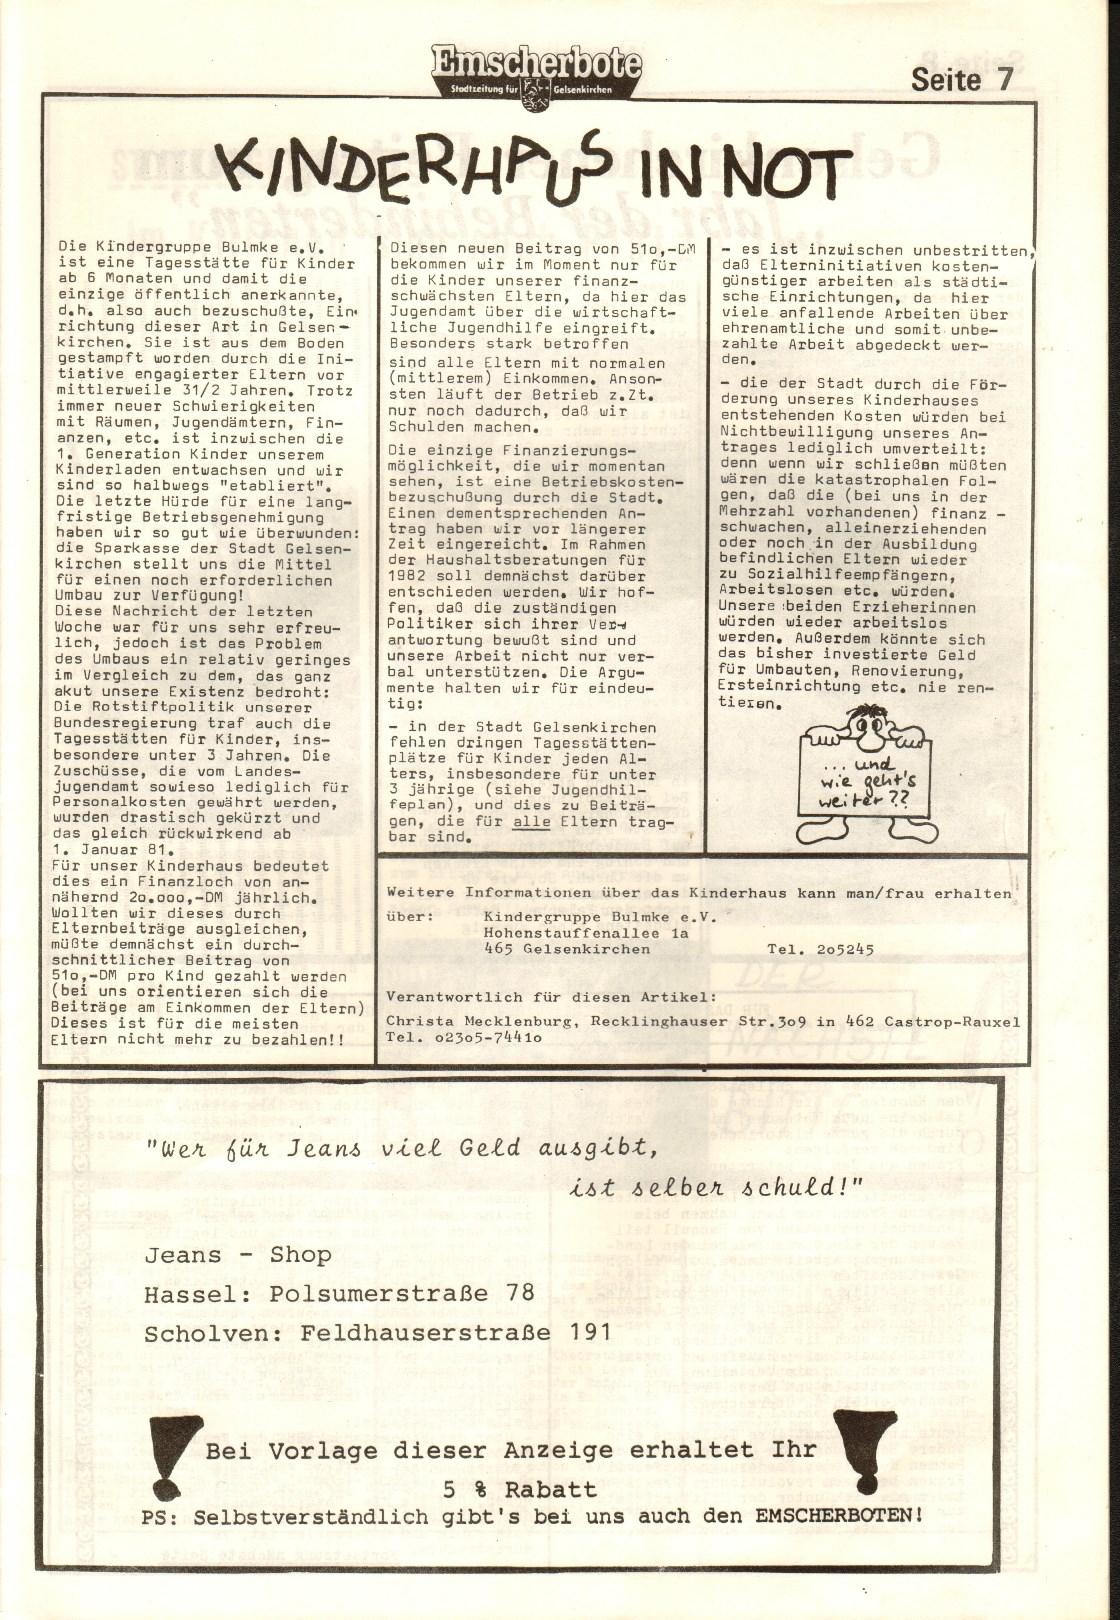 Gelsenkirchen_Emscherbote_1981_12_07